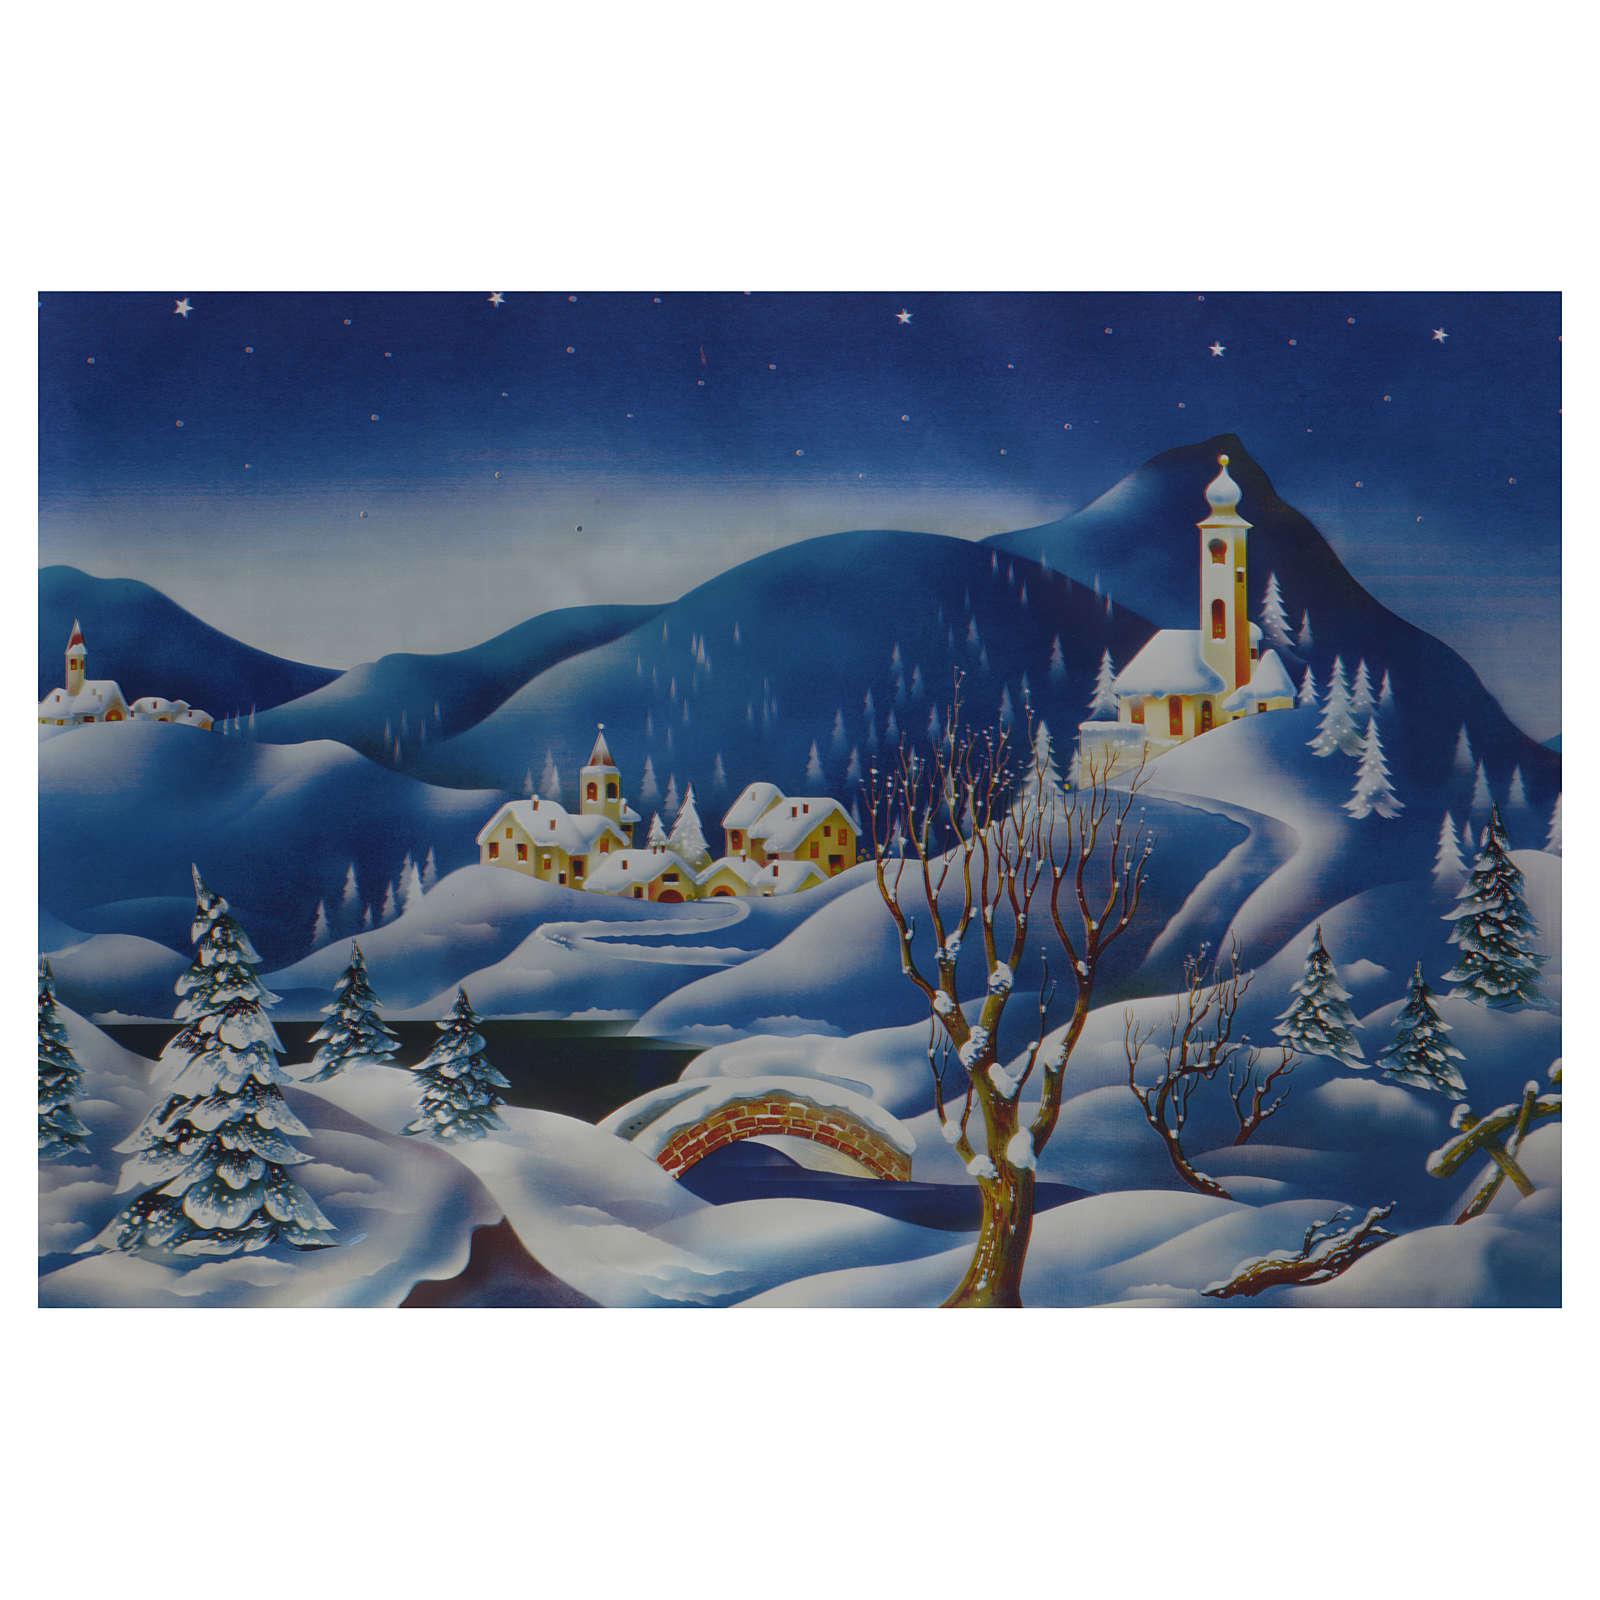 Nativity scene backdrop, winter setting, roll of pvc 70 x 100c 4